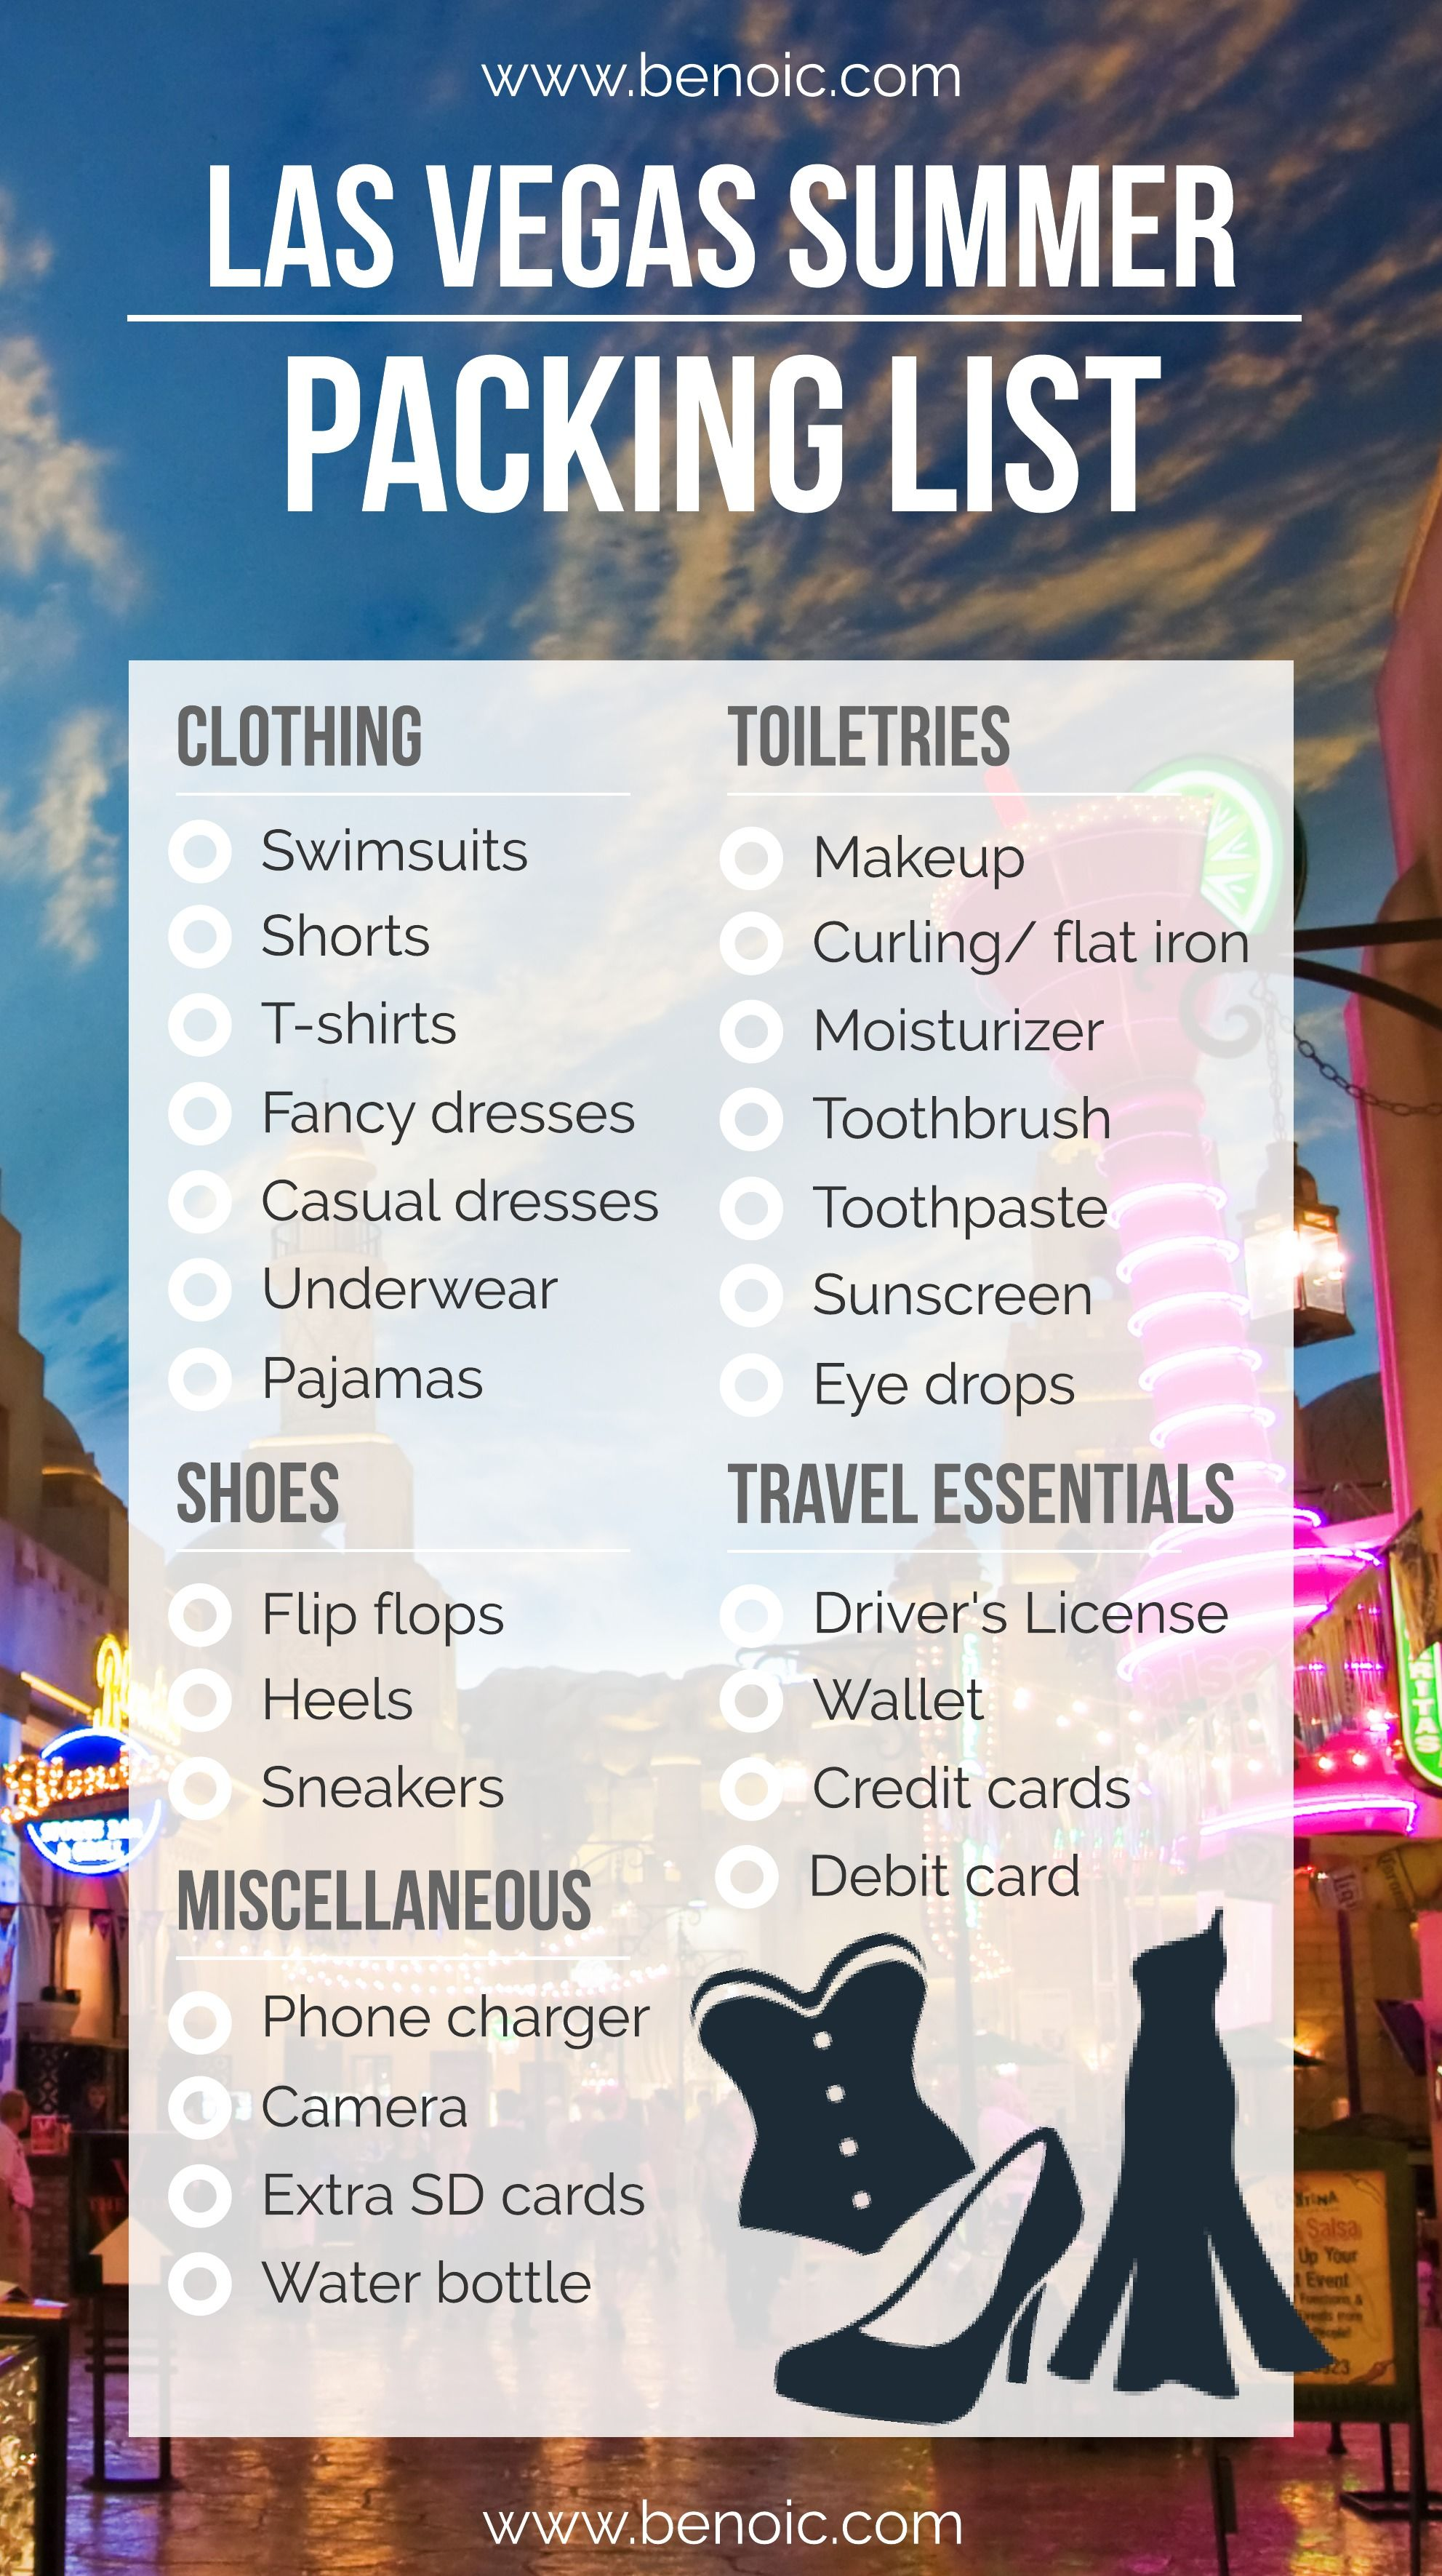 las vegas summer packing list lasvegas summer packinglist travel